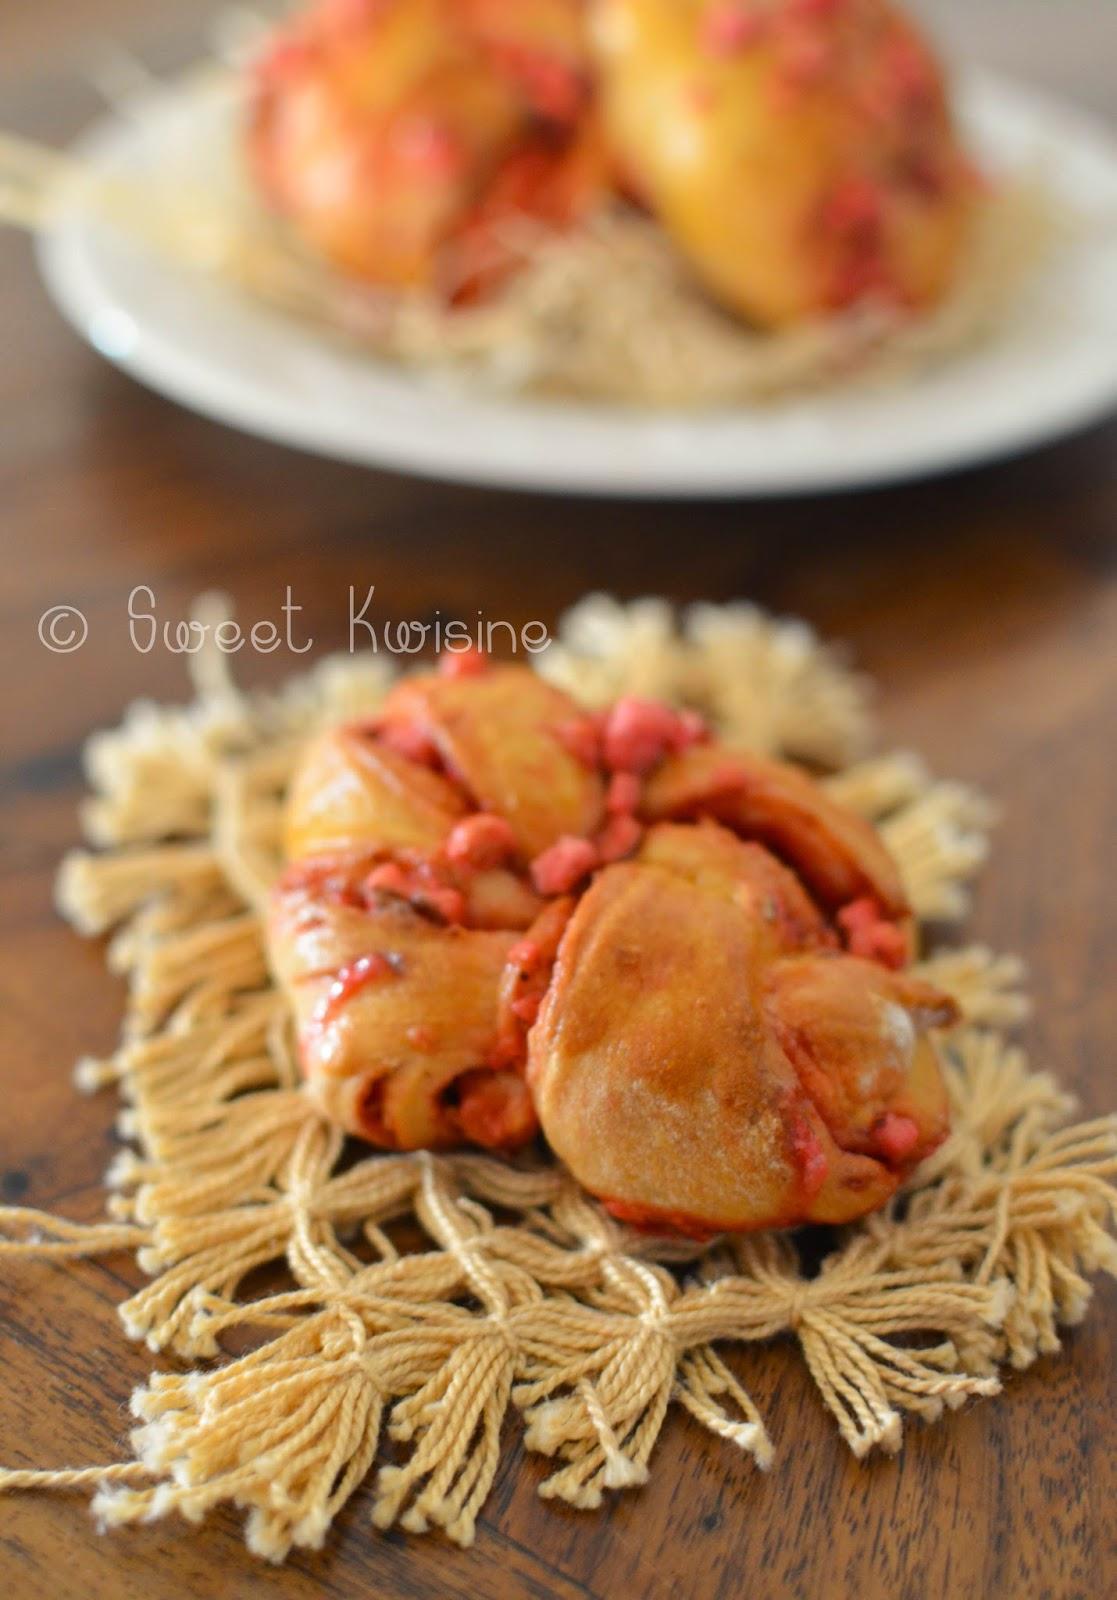 swee kwisine, brioche, boulangerie, pralines roses, saint-valentin, valentine's day, gourmandise,